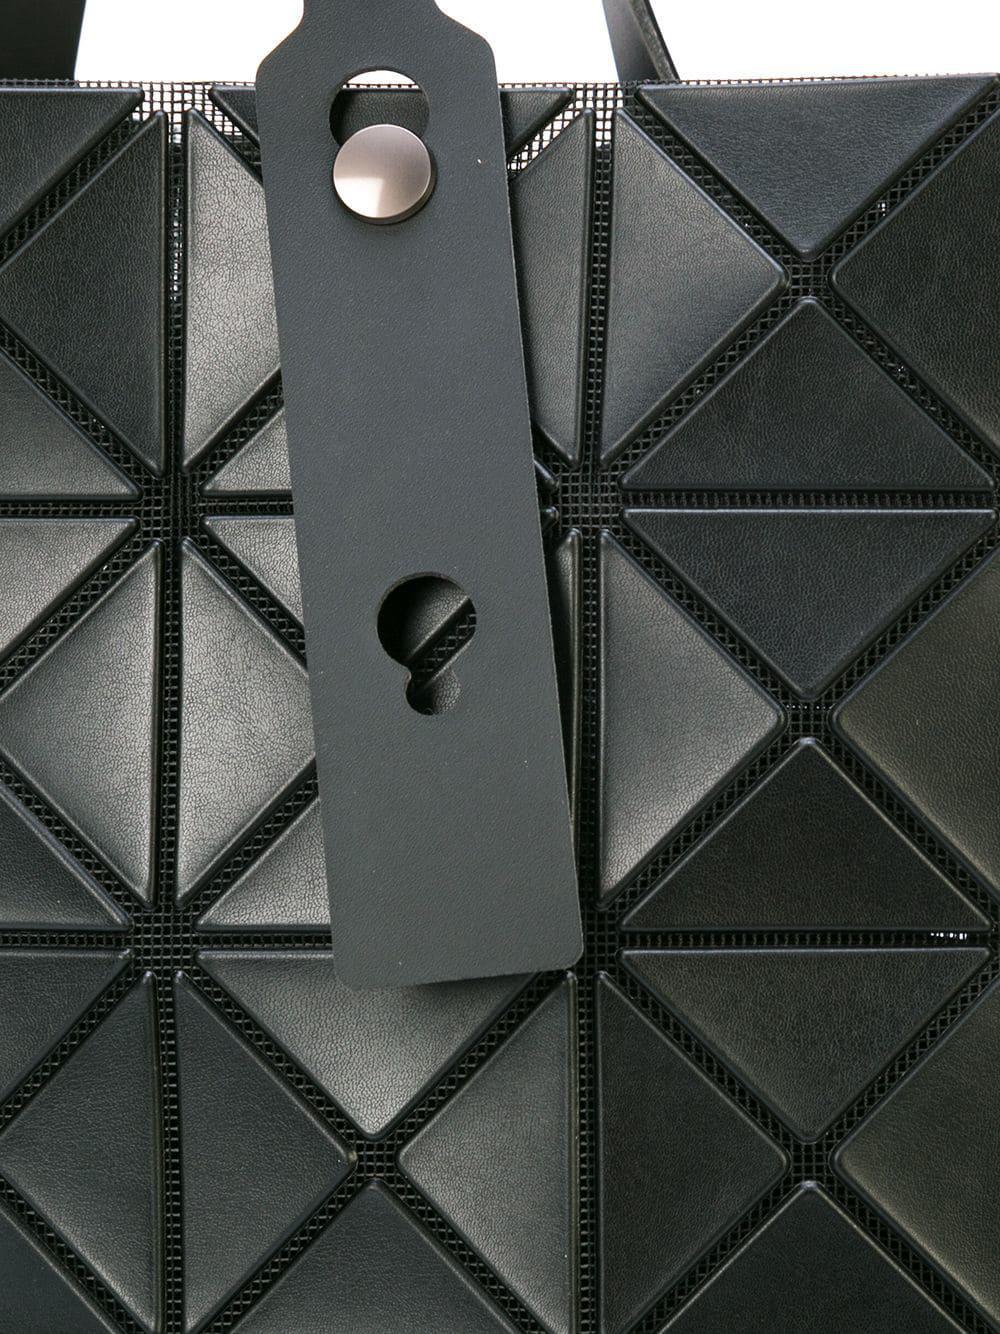 a031c764a40f7 Bao Bao Issey Miyake Articulated Geometric Panel Tote Bag in Black - Lyst